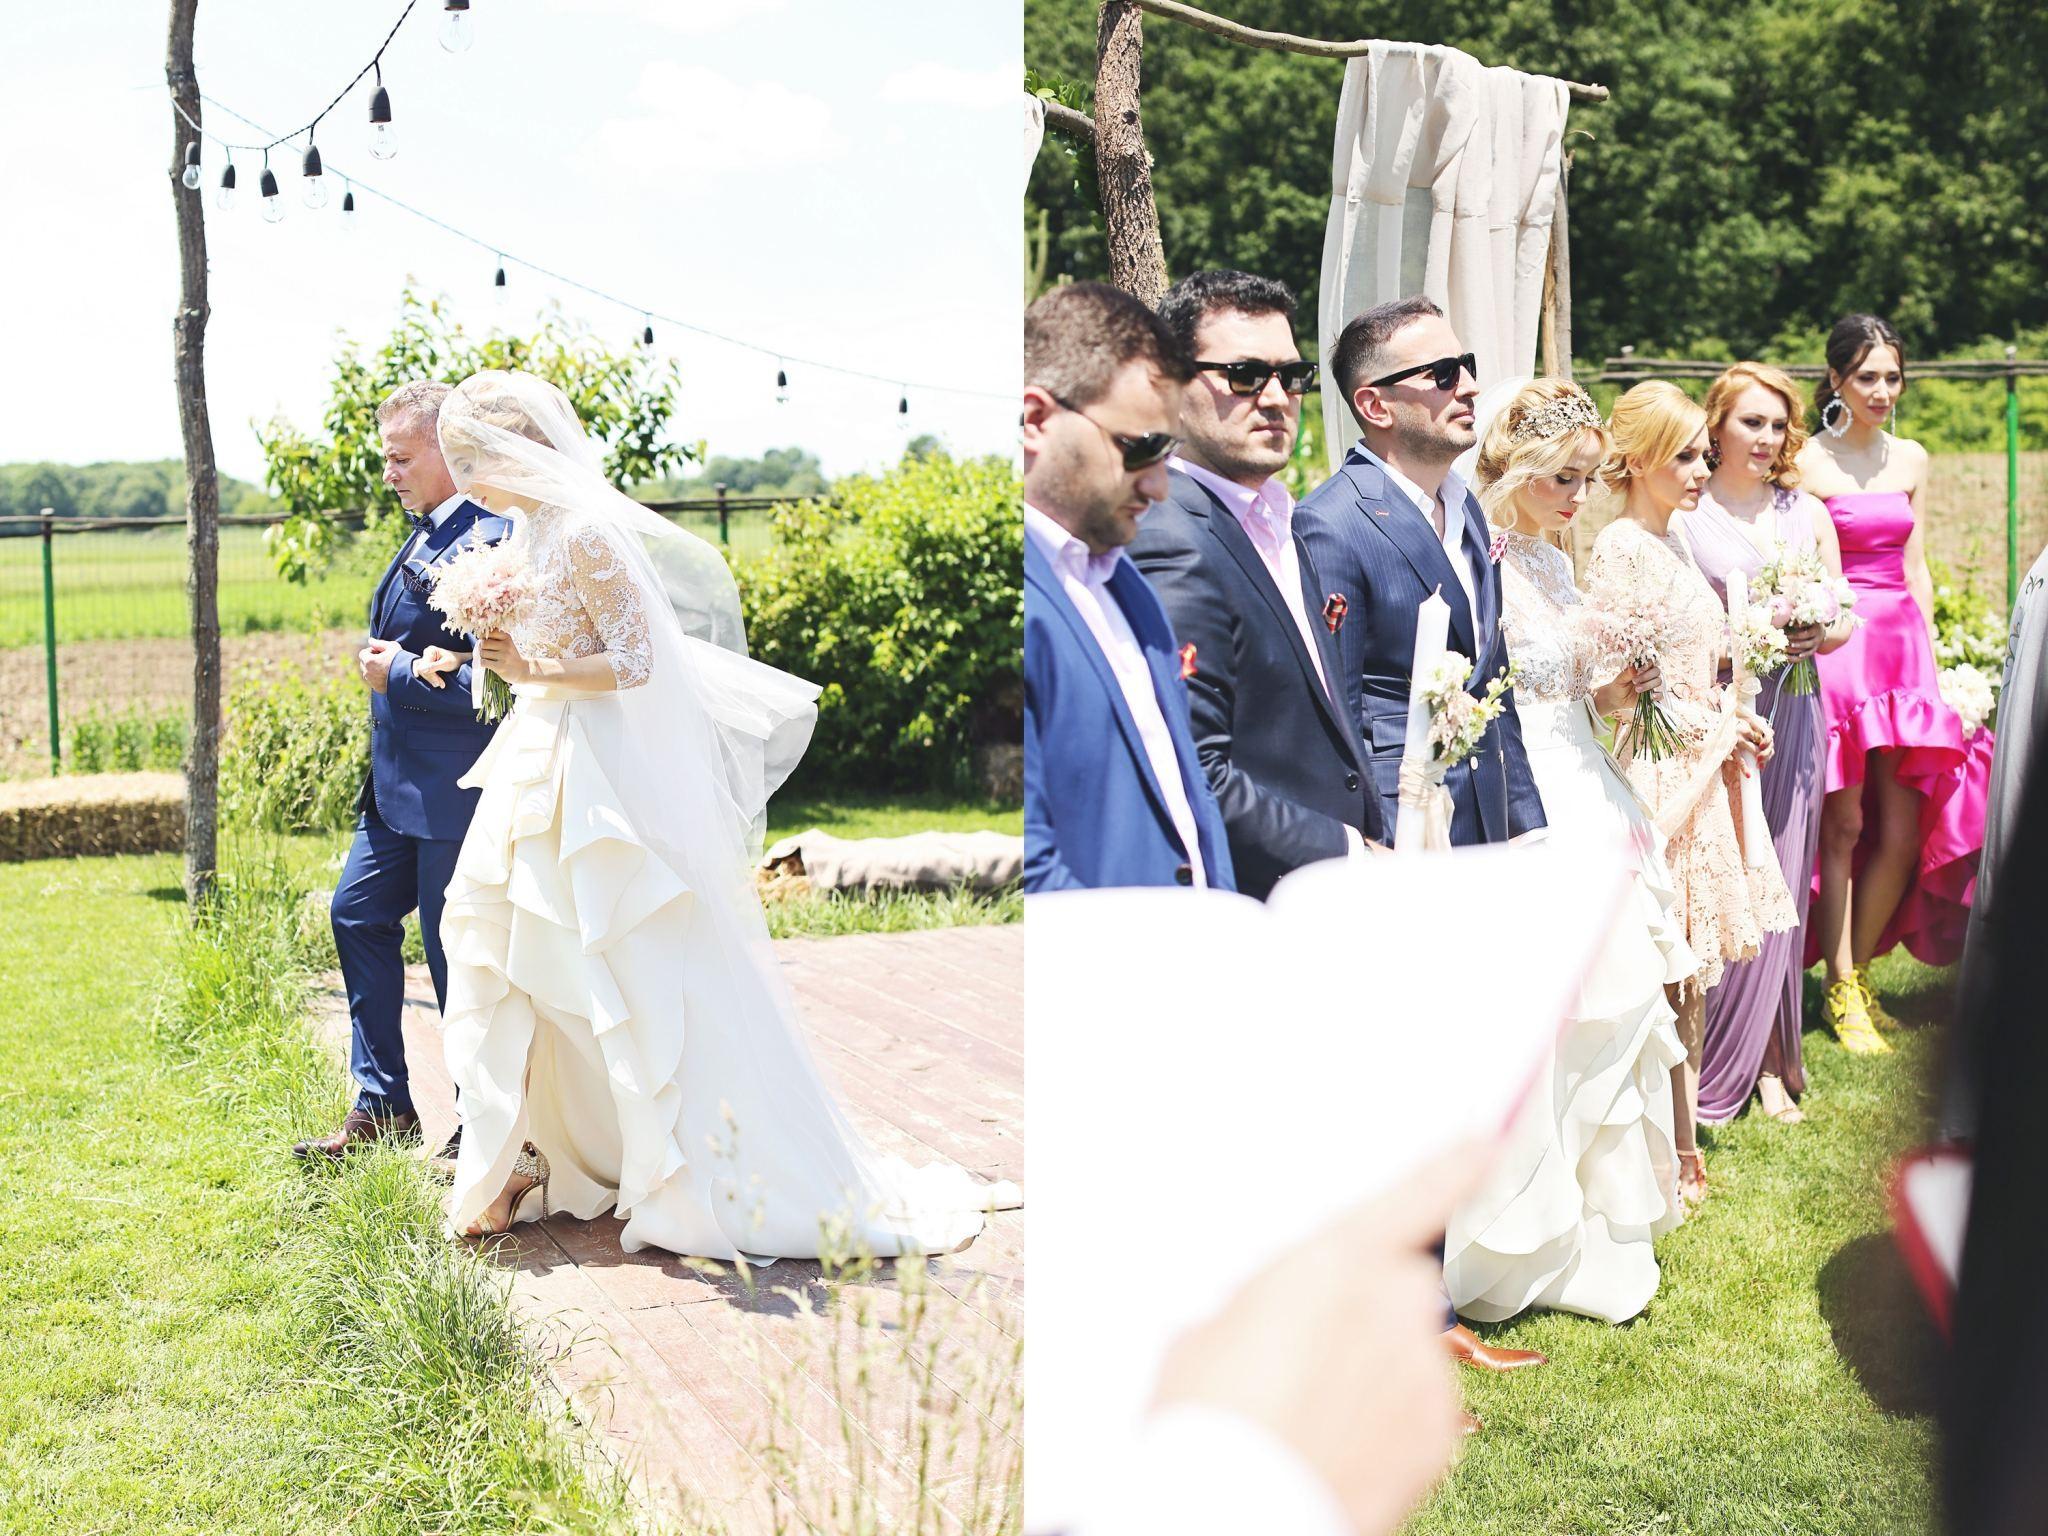 21Fabuloasasemarita_alina_tanasa_diana_enciu_fabulous_muses_blogger_wedding_famous wedding_nunta2016